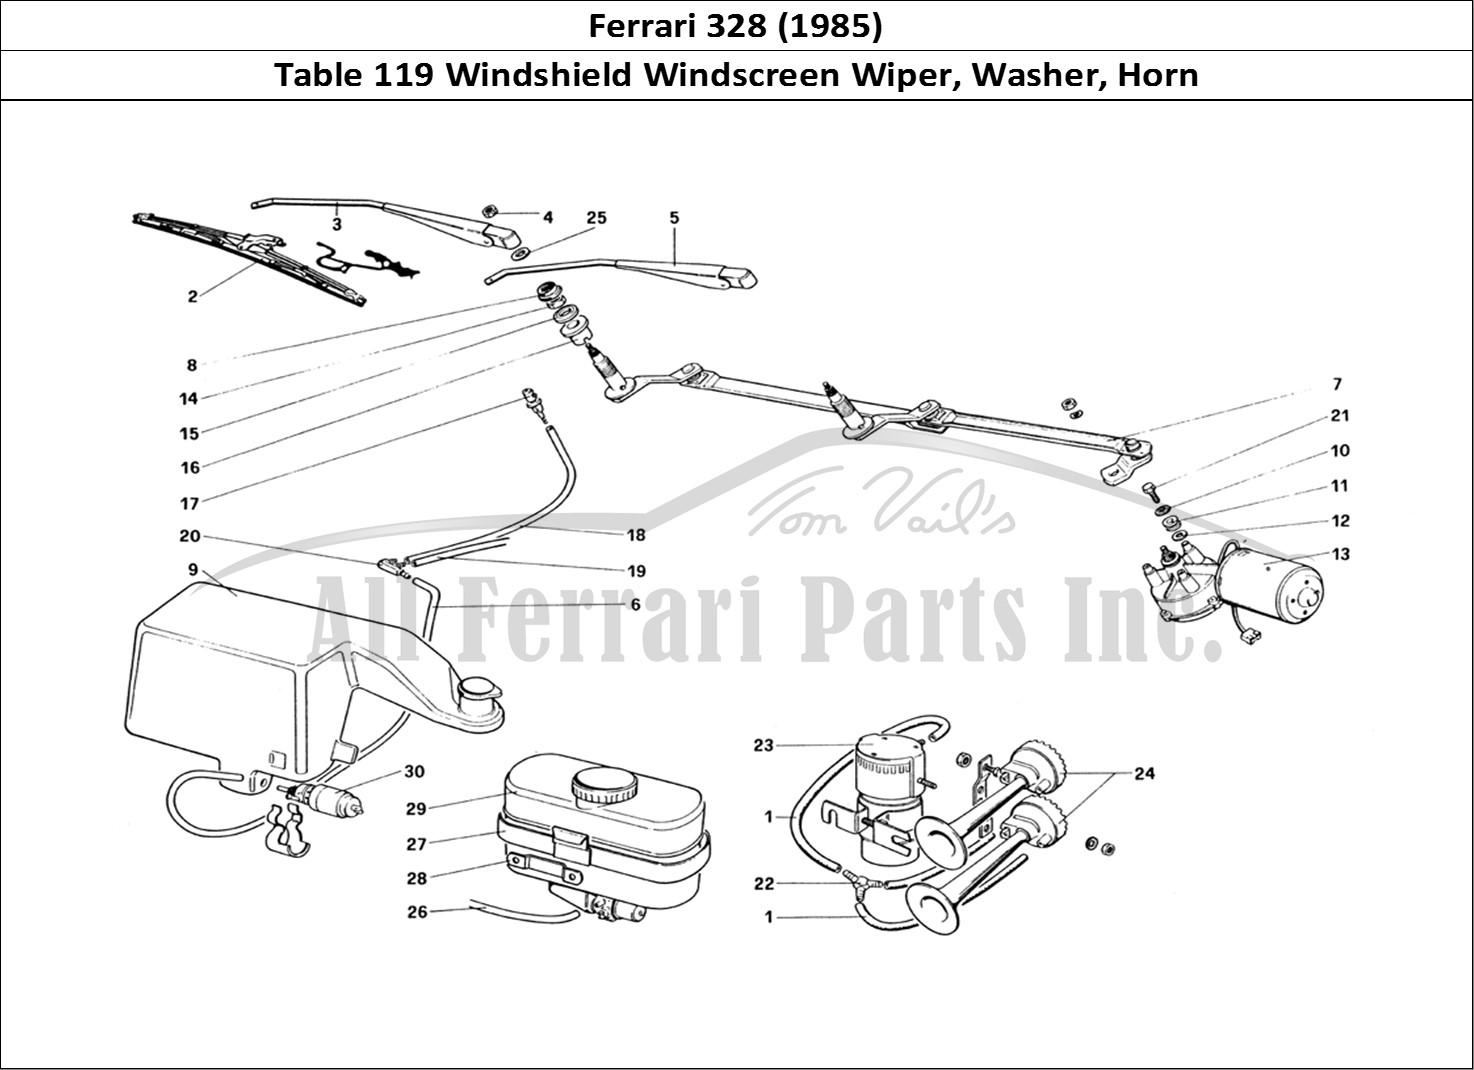 Buy original Ferrari 328 (1985) 119 Windshield Windscreen